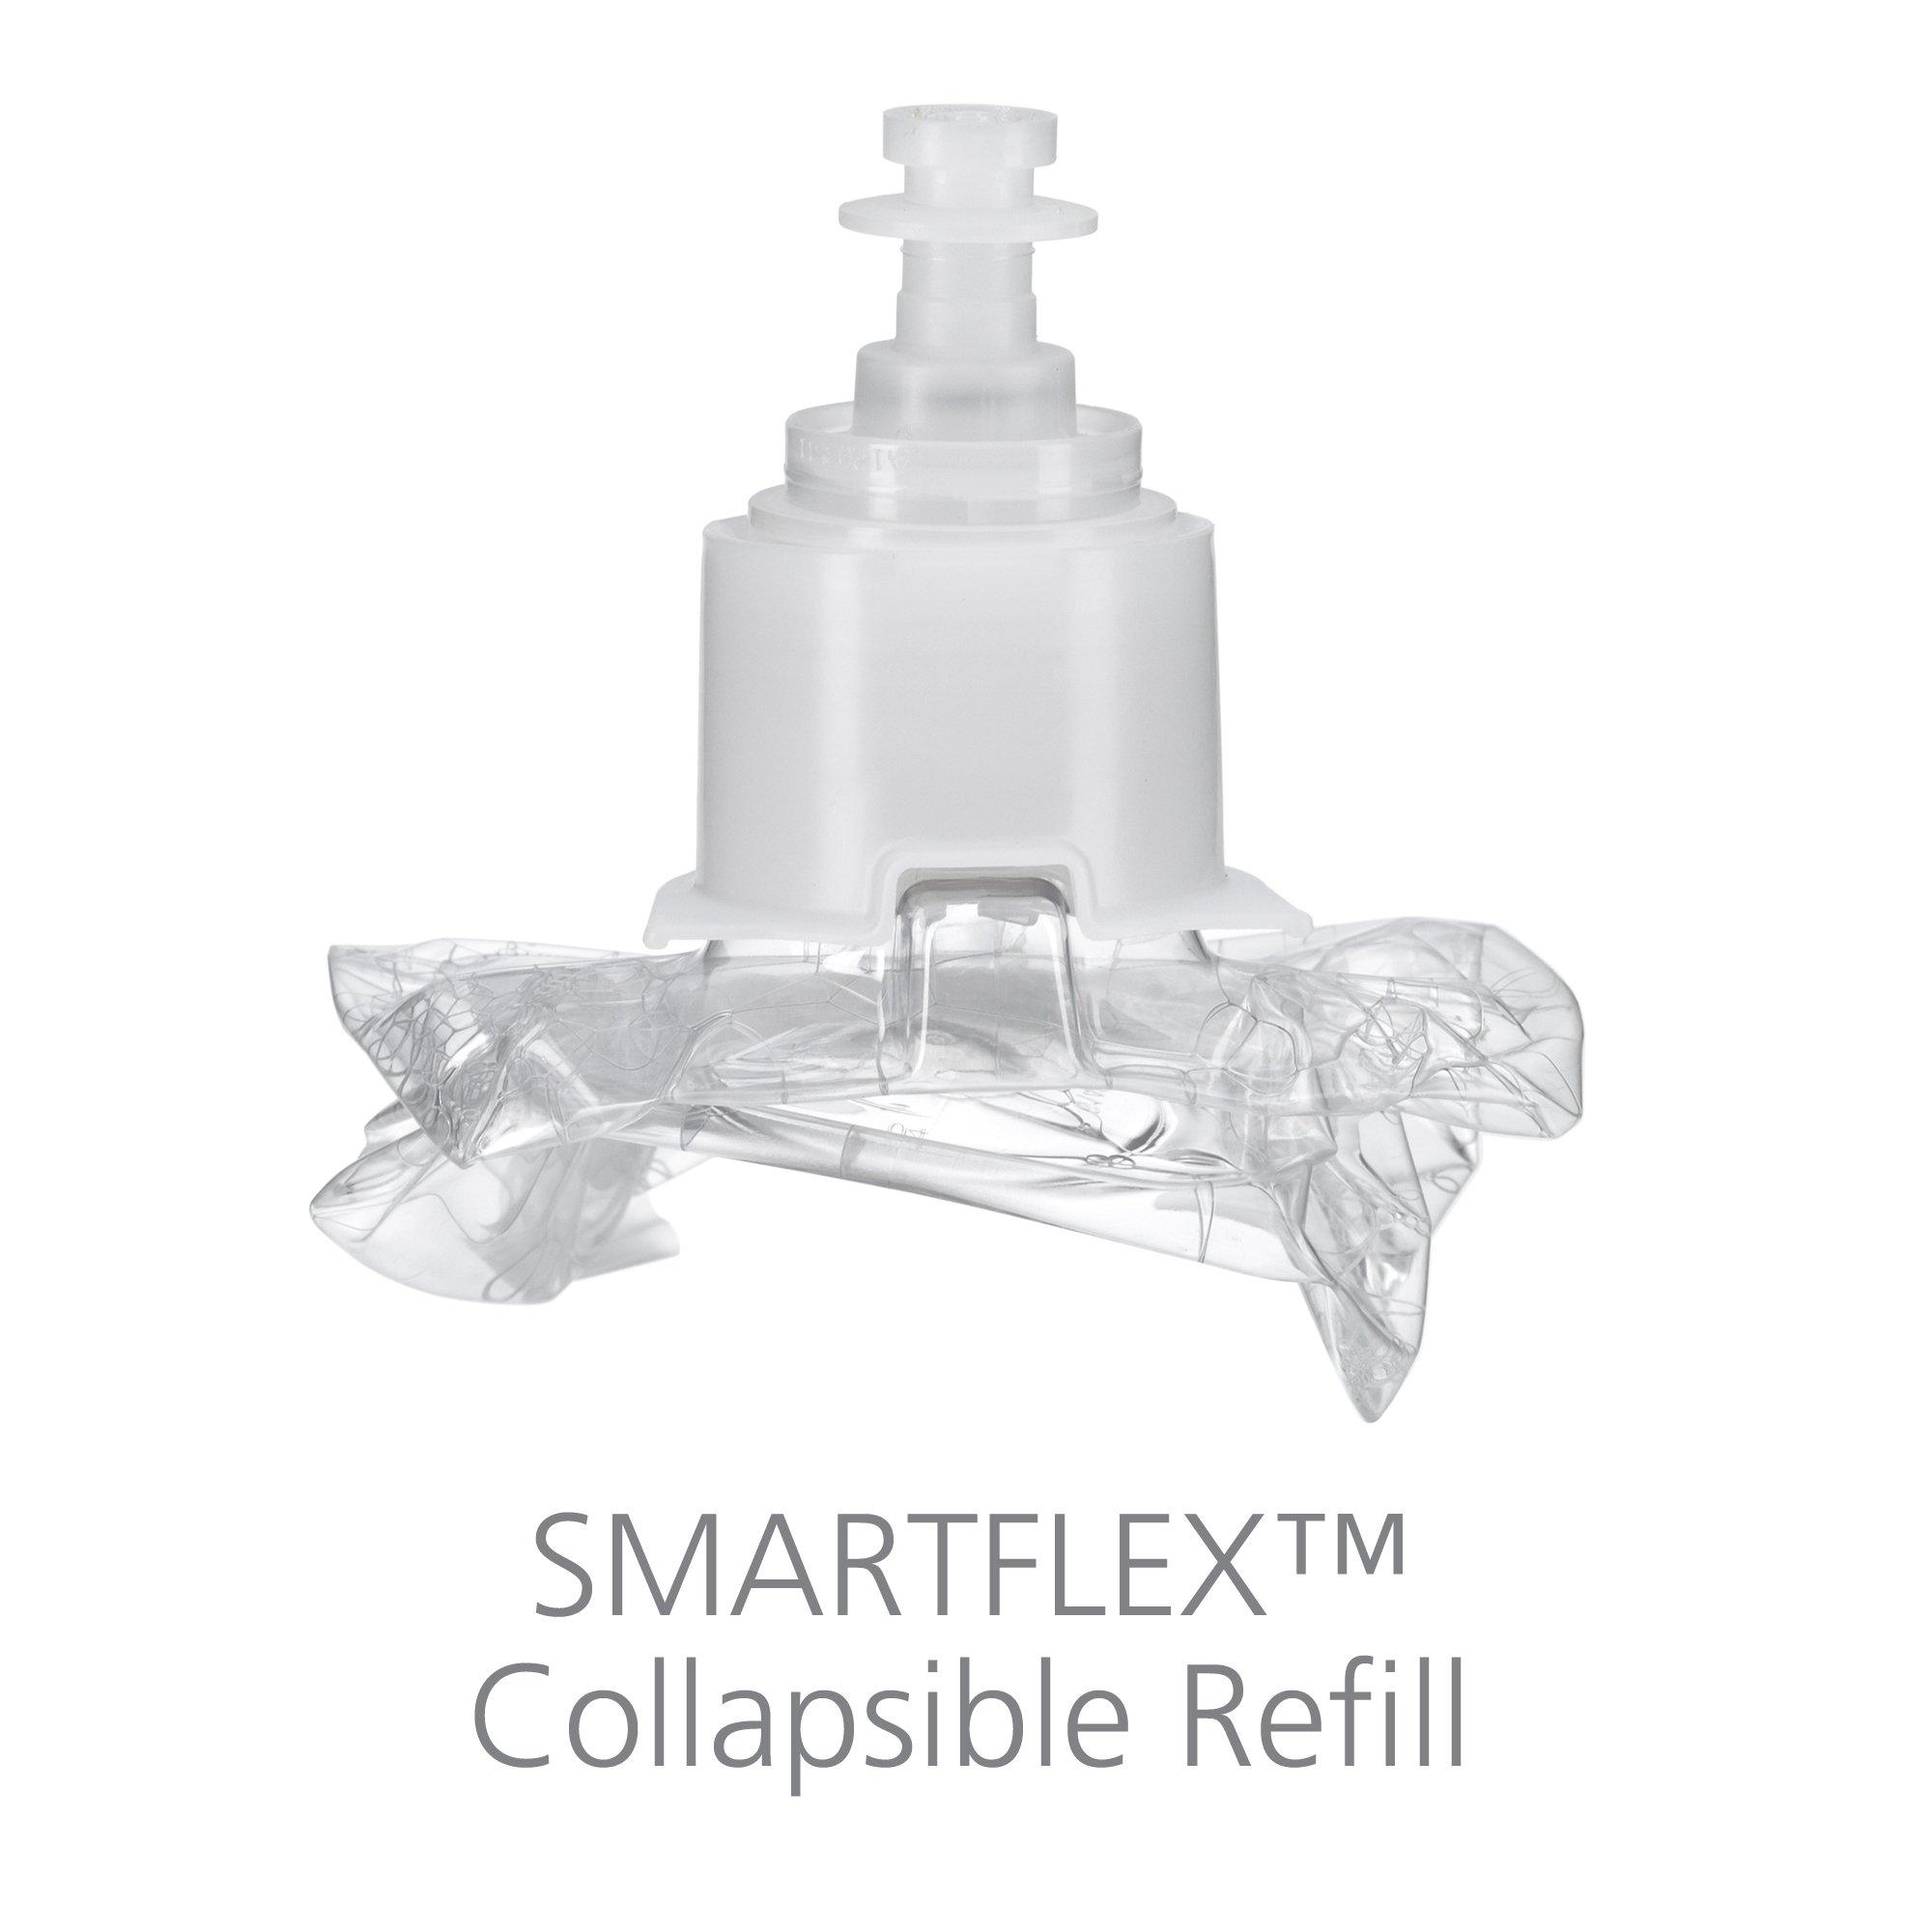 PURELL LTX-7 Advanced Hand Sanitizer Foam, 700 mL Sanitizer Refill for LTX-7 Touch-Free Dispenser (Case of 3) - 1305-03